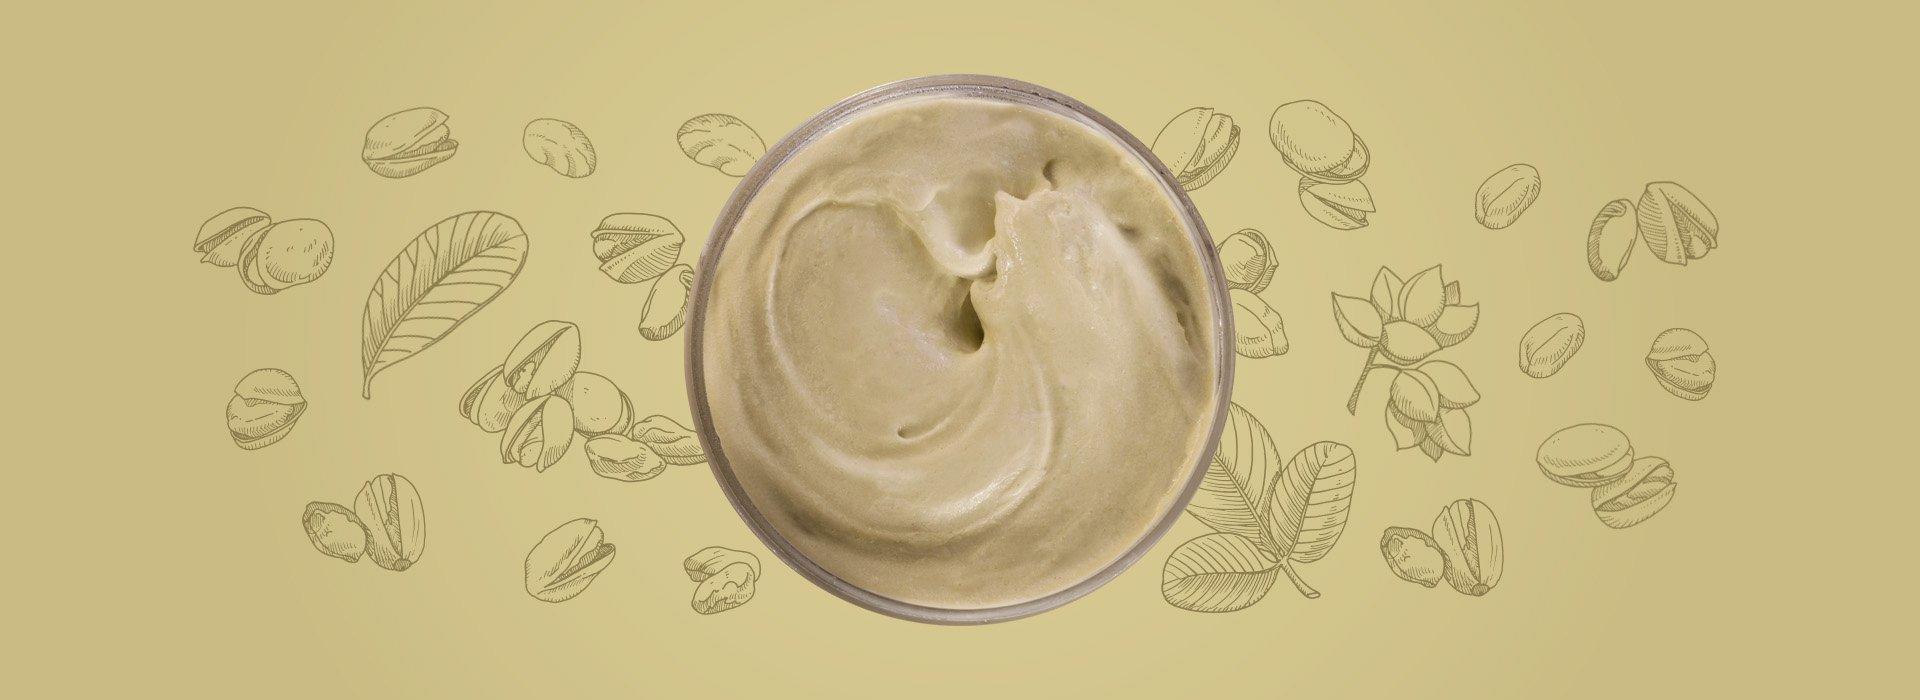 Grom pistachio ice cream